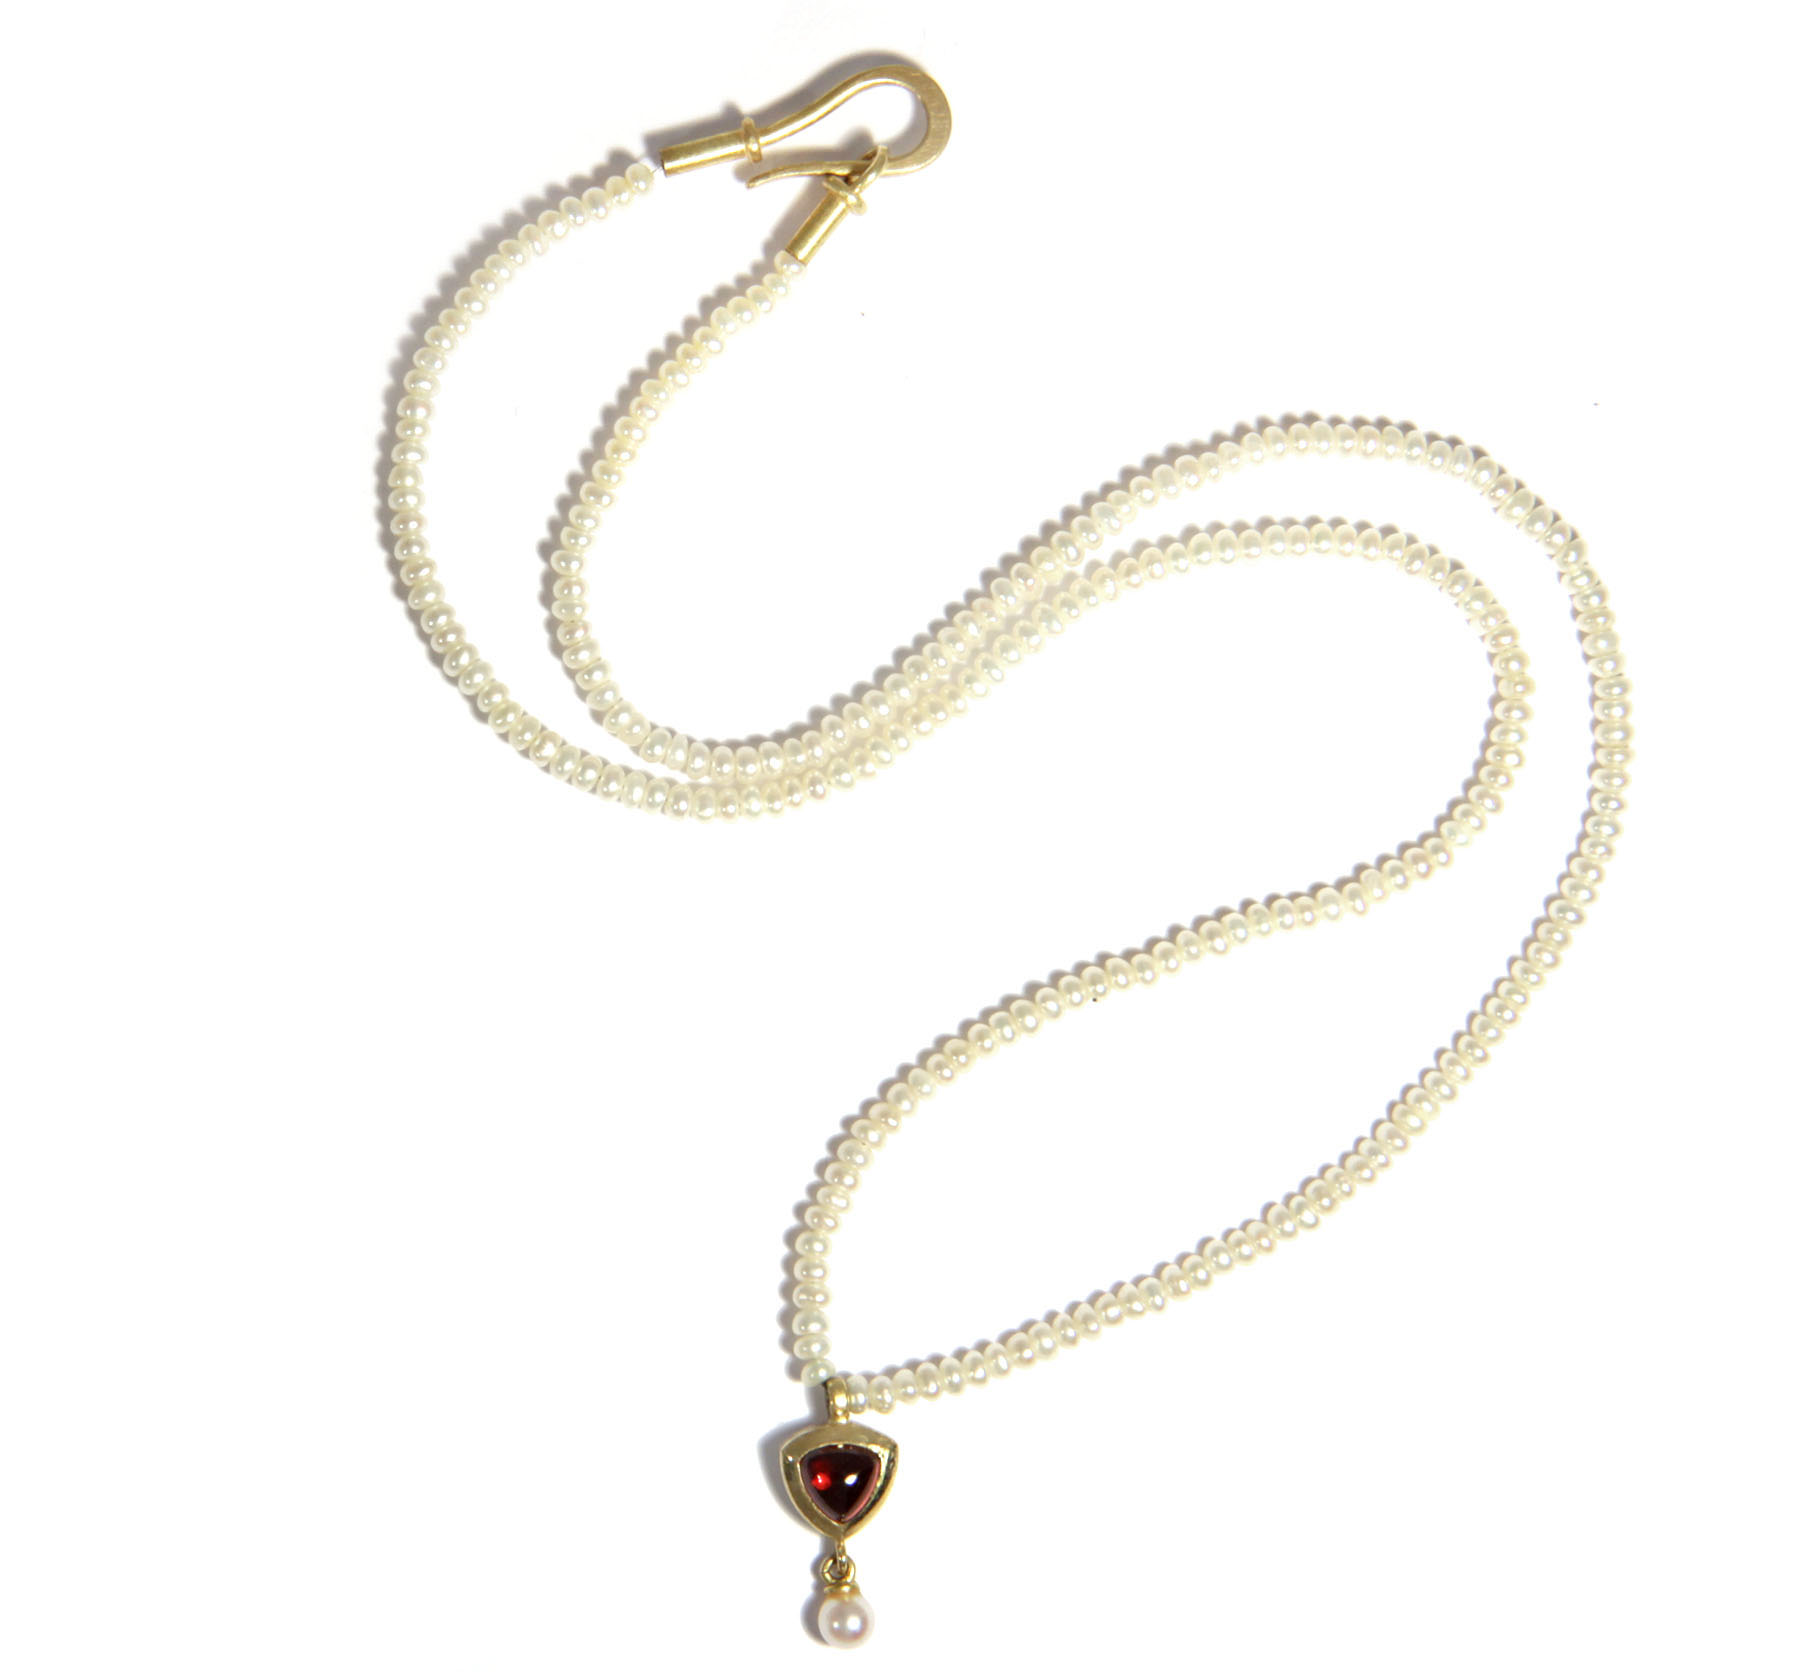 feine perlenkette spessartin anh nger zuchtperlen gold 750 kette collier perlen ebay. Black Bedroom Furniture Sets. Home Design Ideas